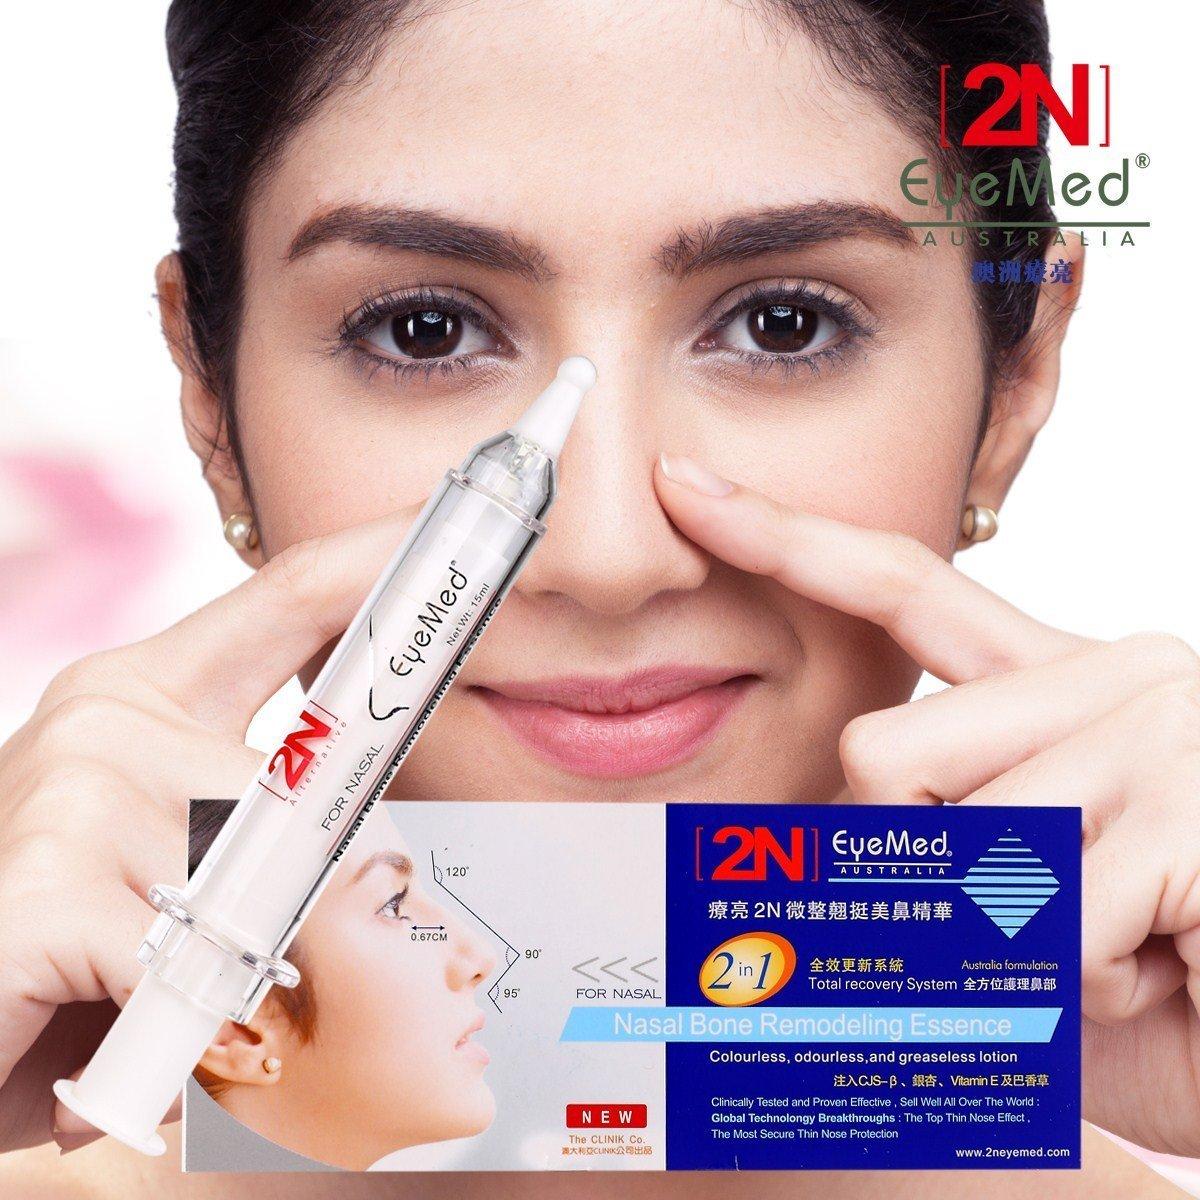 Amazon.com : Nose Cream, Nose Upright Essence for Slimming Nose